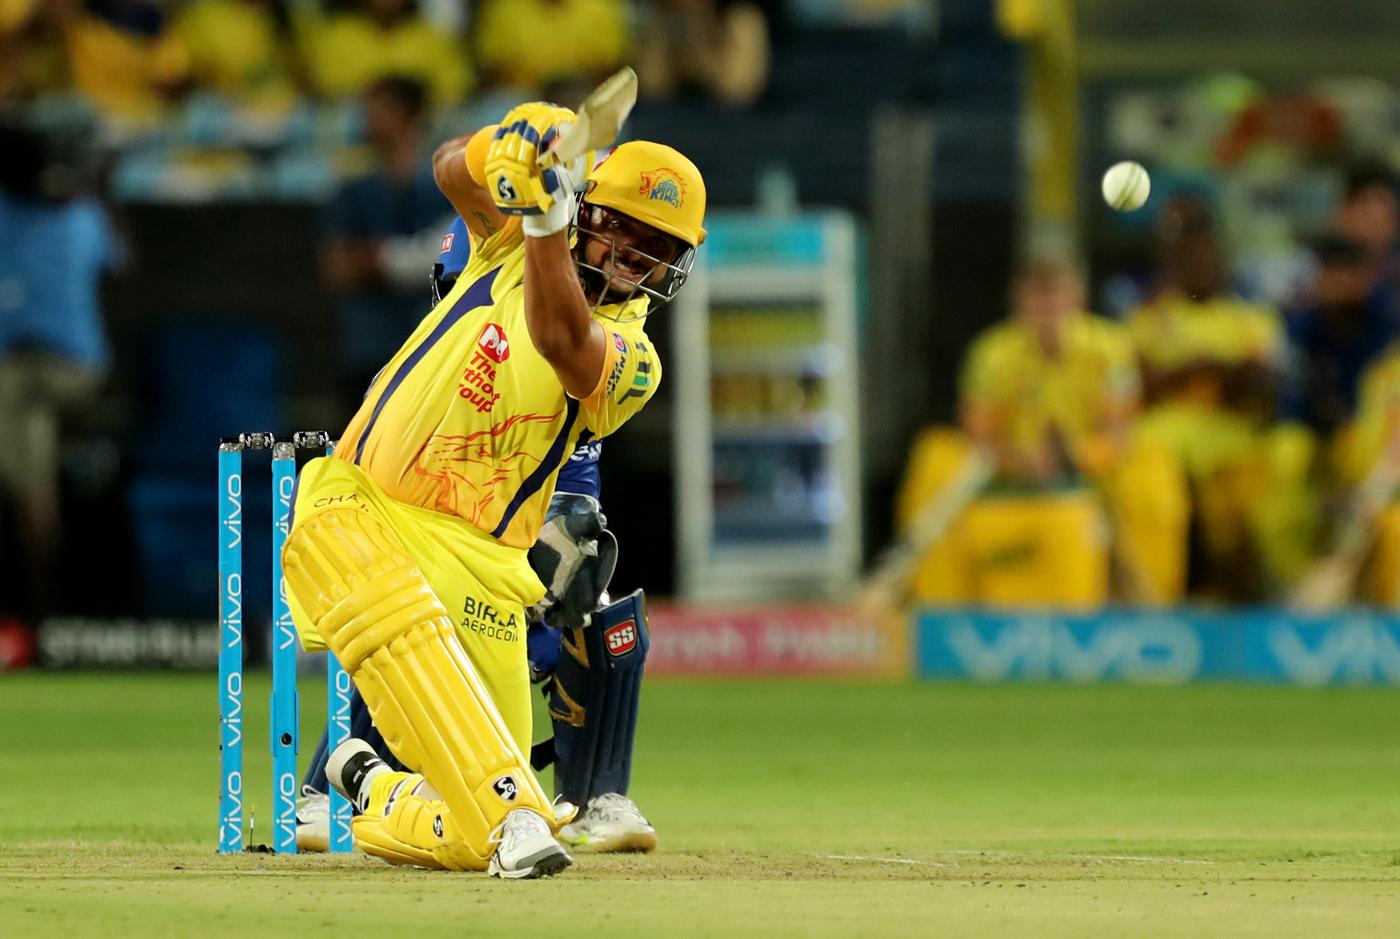 IPL 2018: Match 27, Chennai Super Kings vs Mumbai Indians – Statistical Highlights